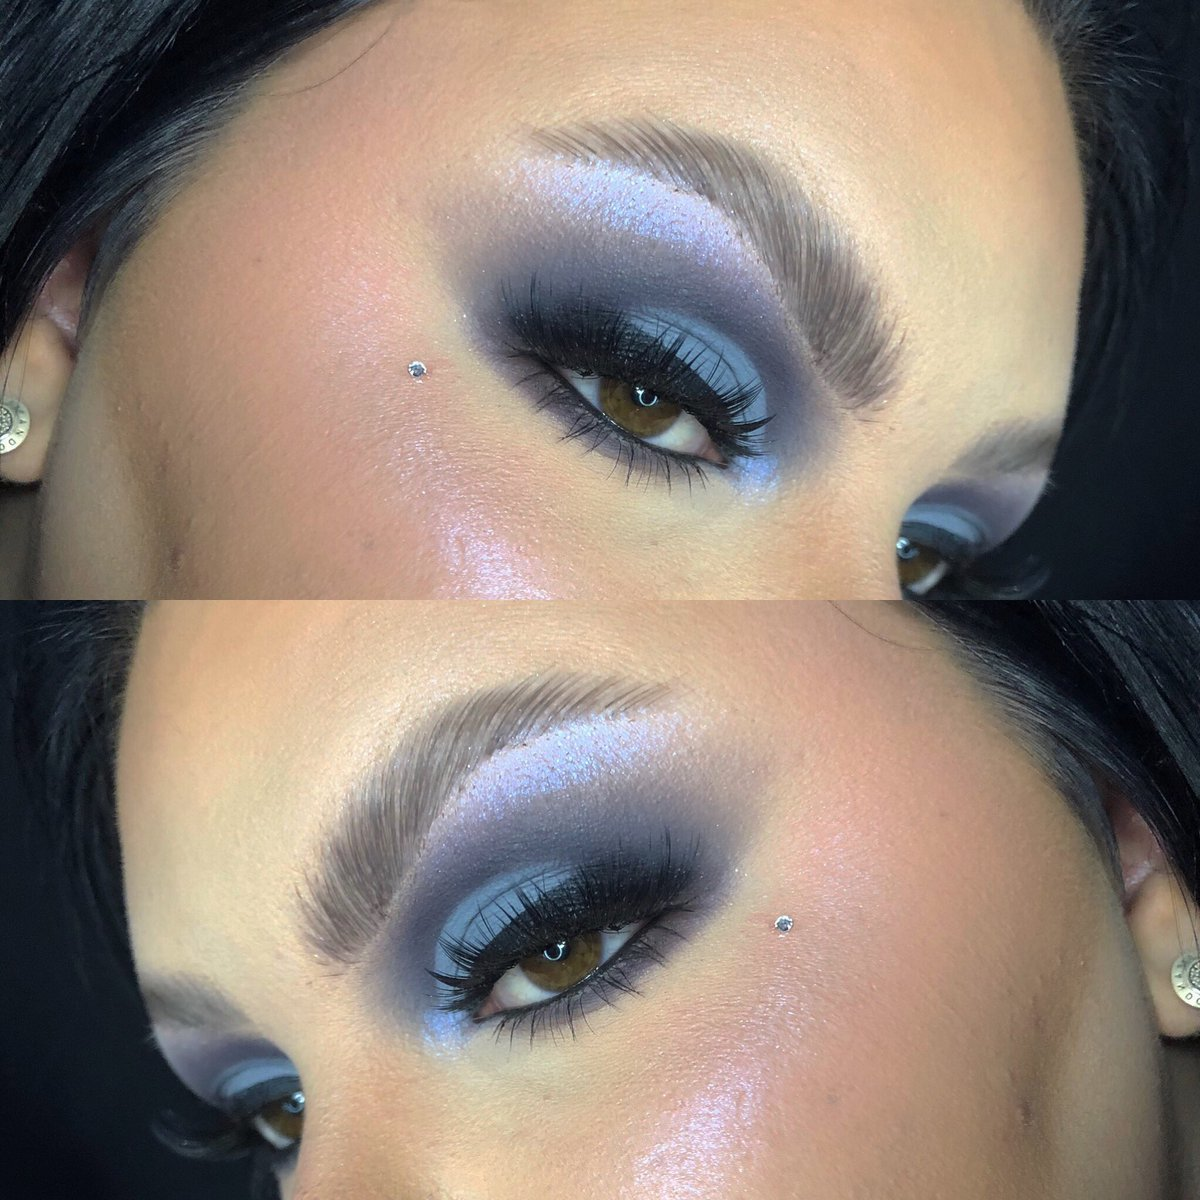 love grey tones🥺🐘 @plouiseacademy crisp finish paint 'nice n saucy' used #mua #makeup #makeupinspo #makeupartist #superdrugspotlight #superdrug #plouise #bperfectcosmetics #staceymariemua